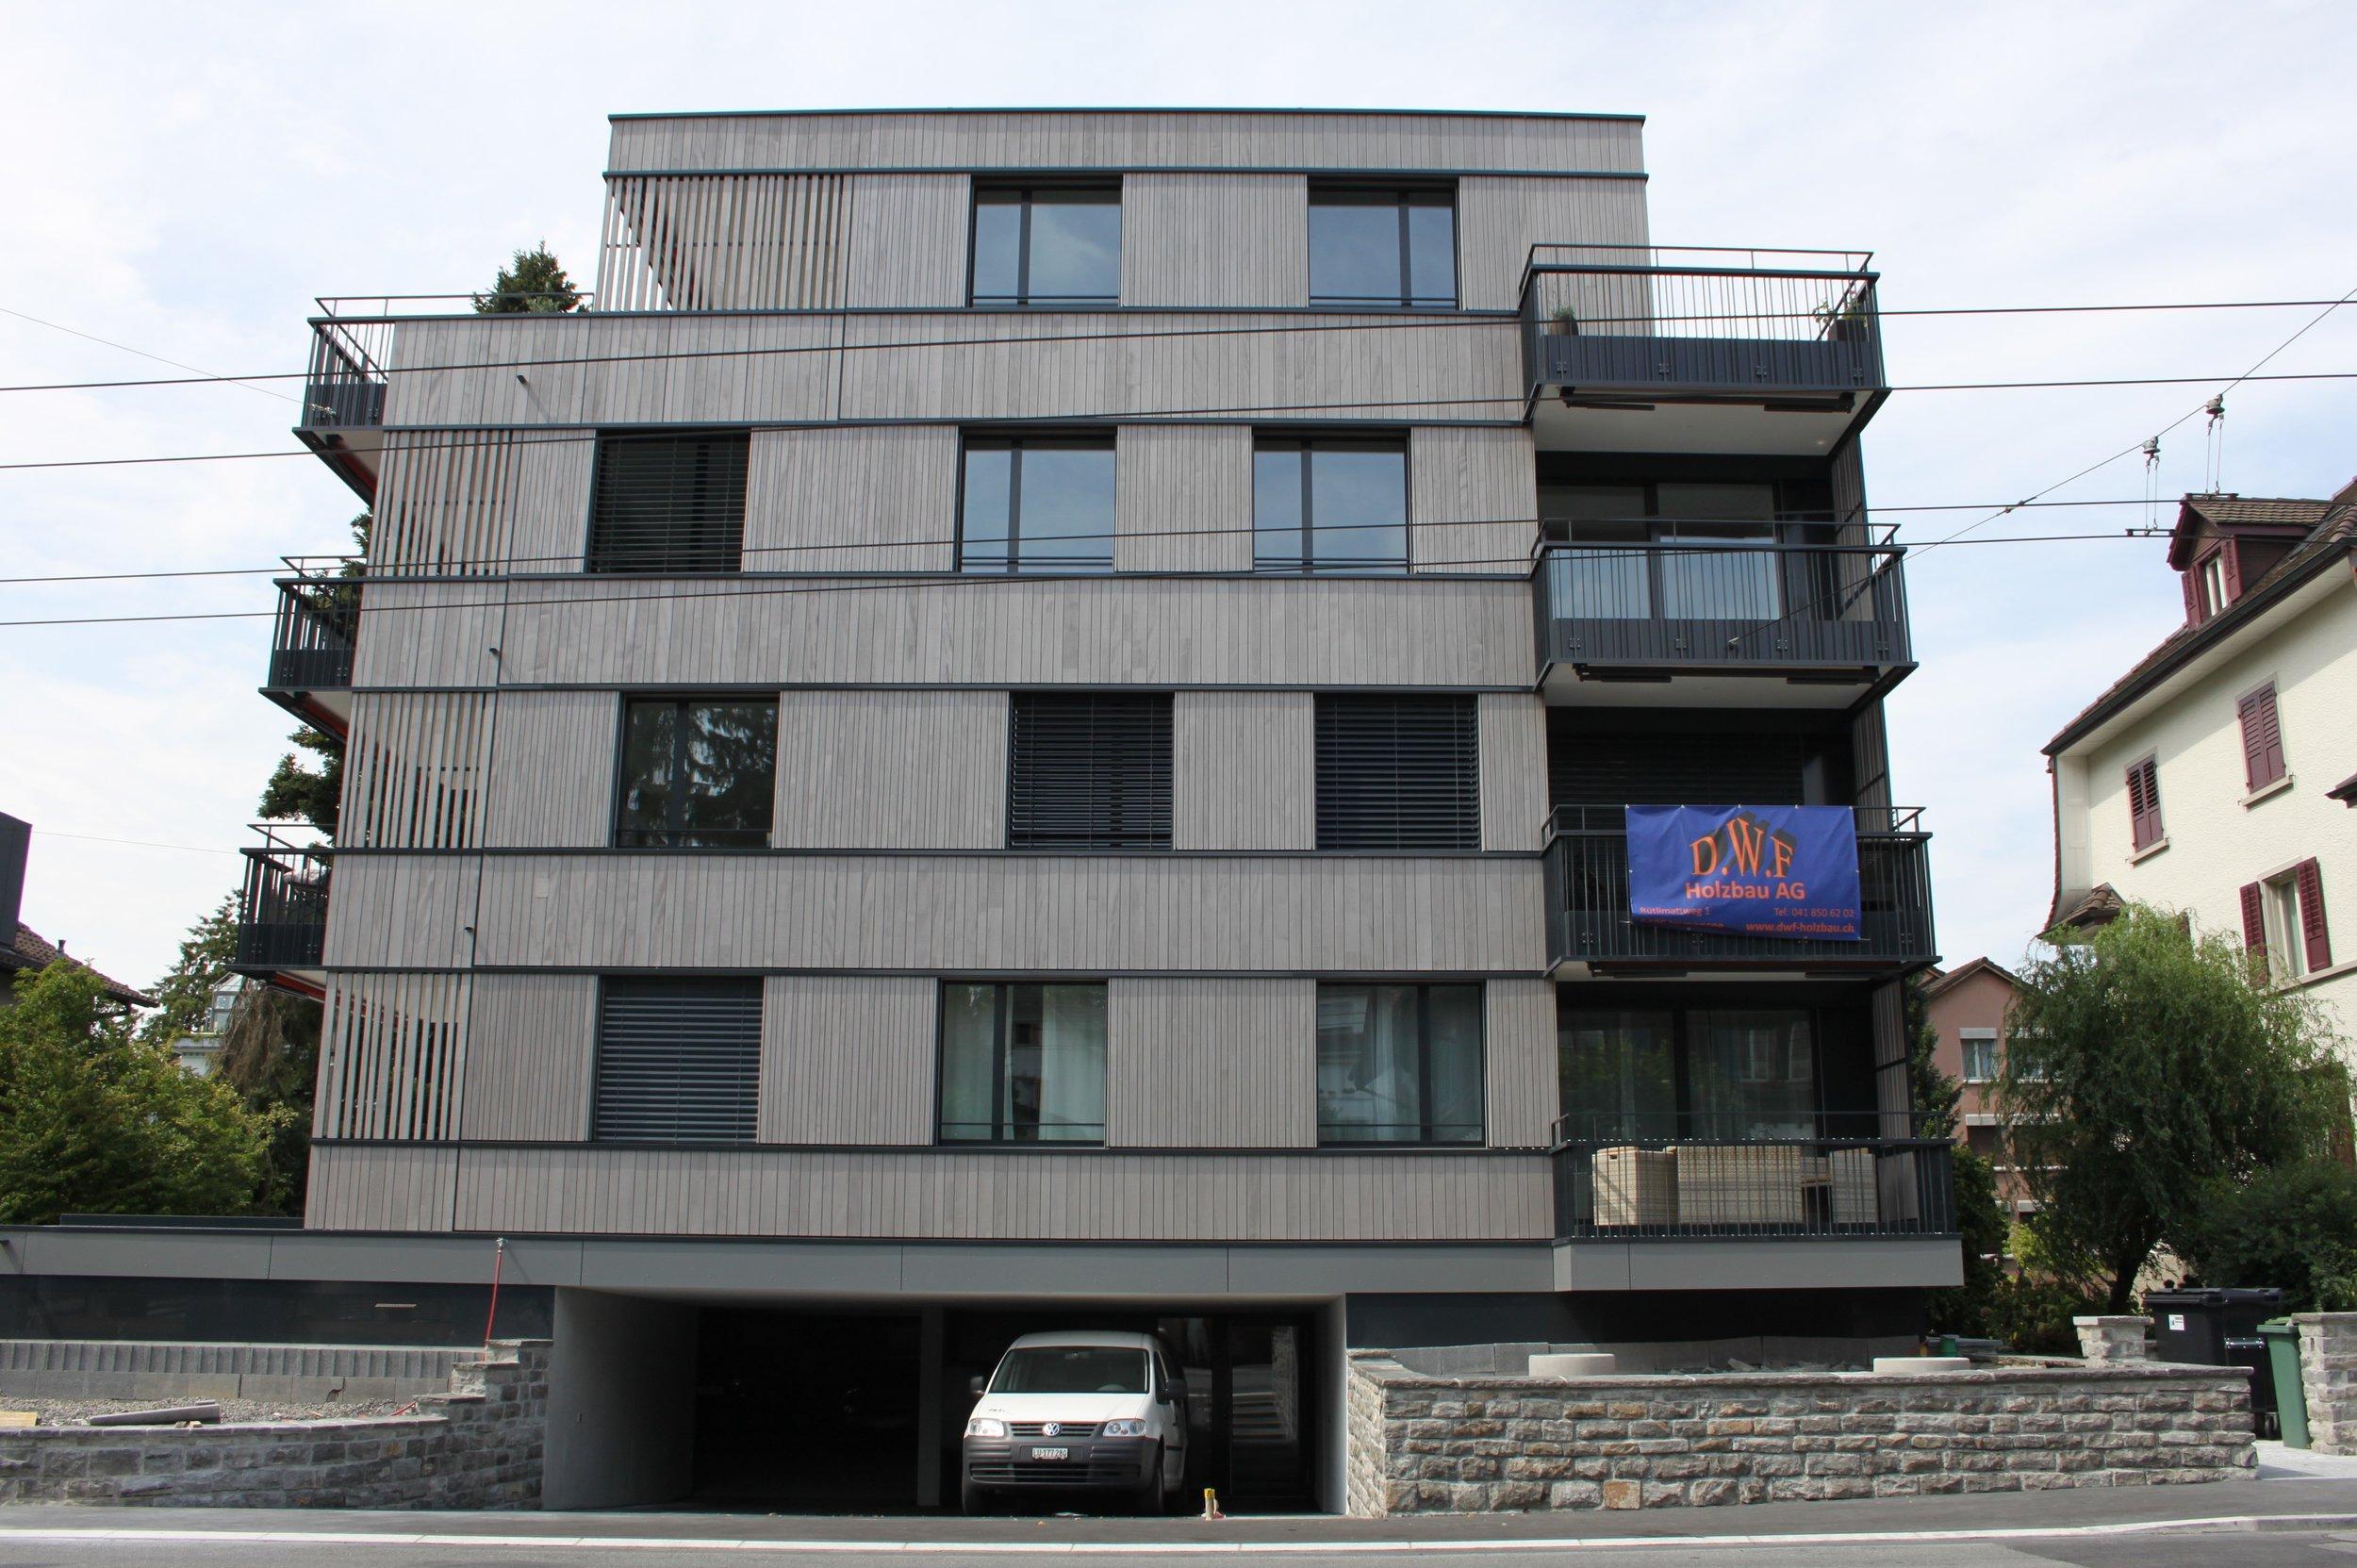 Holzfassade Luzern